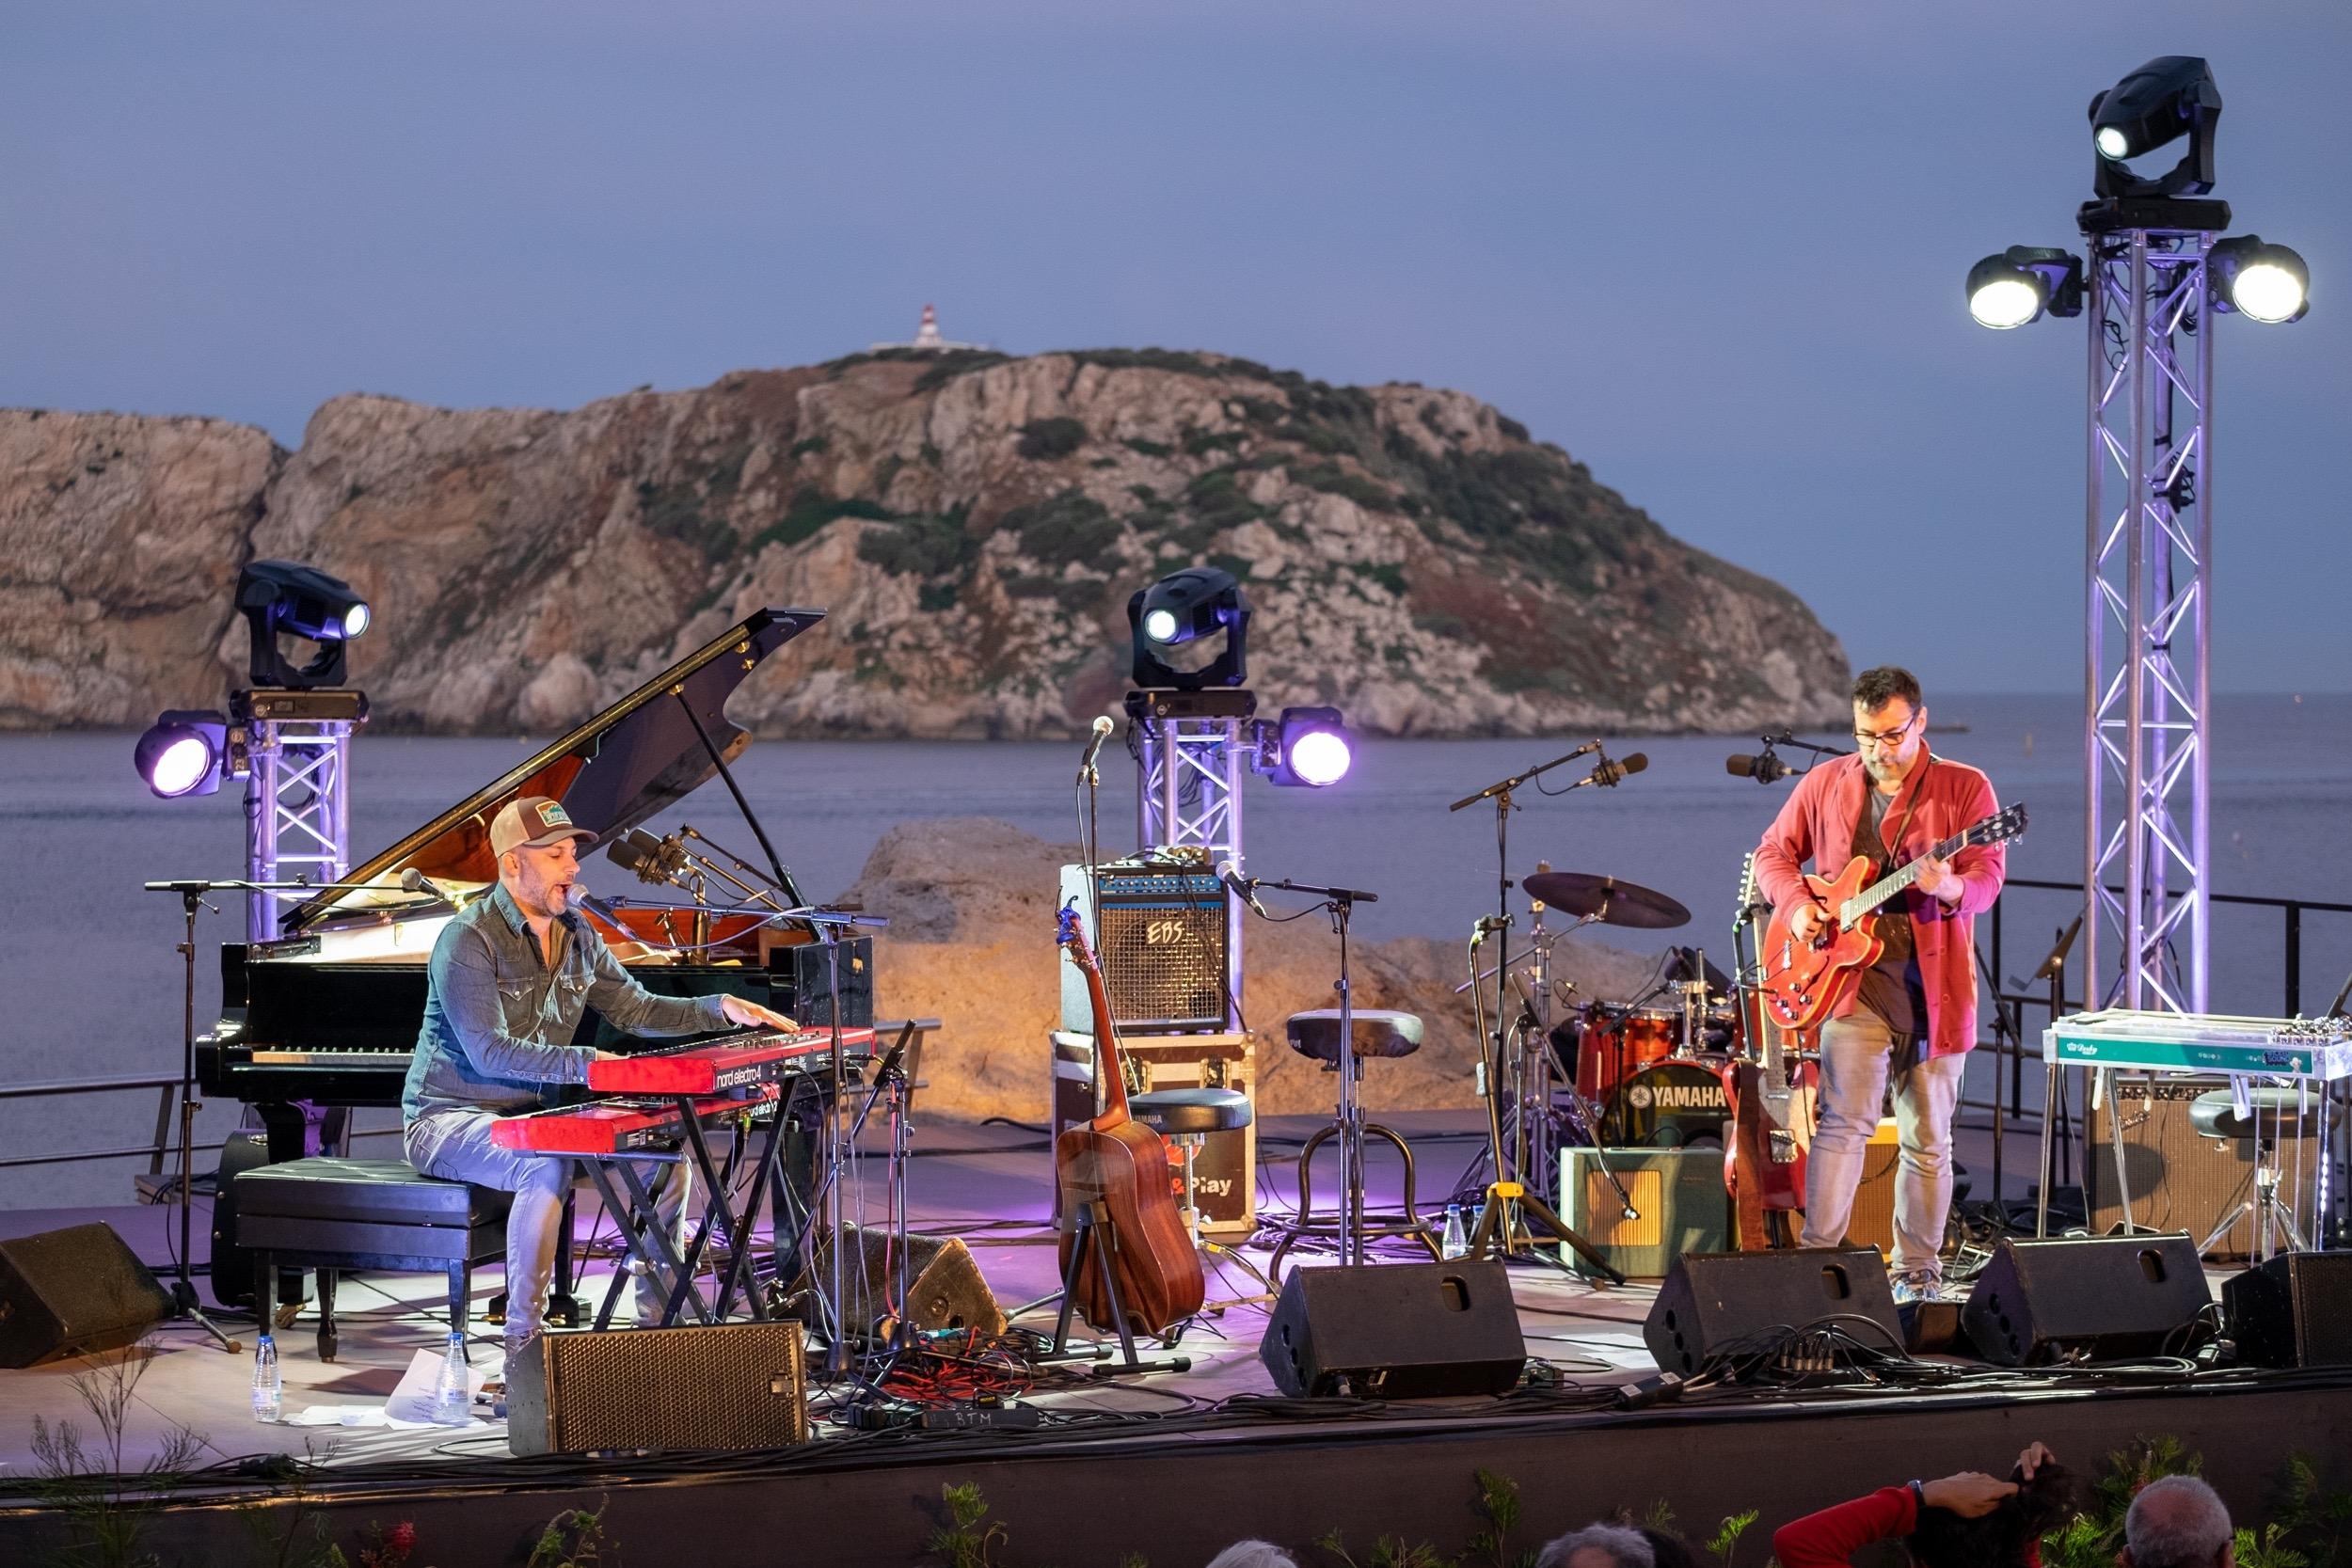 Festival de Jazz - L'Estartit, Spain July 2018